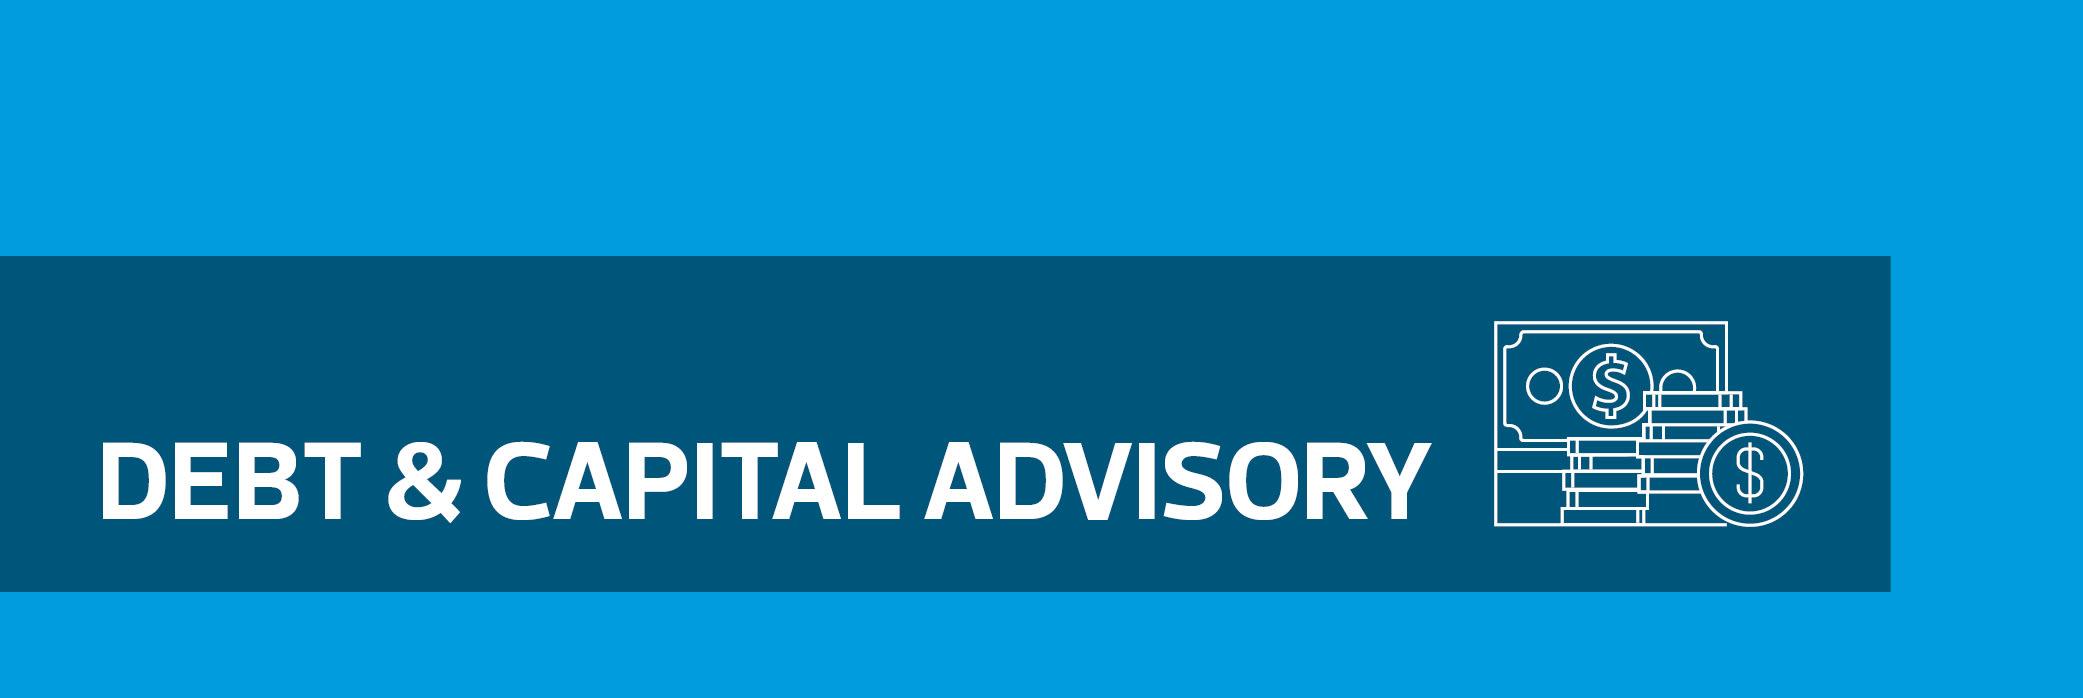 Debt and Capital Advisory